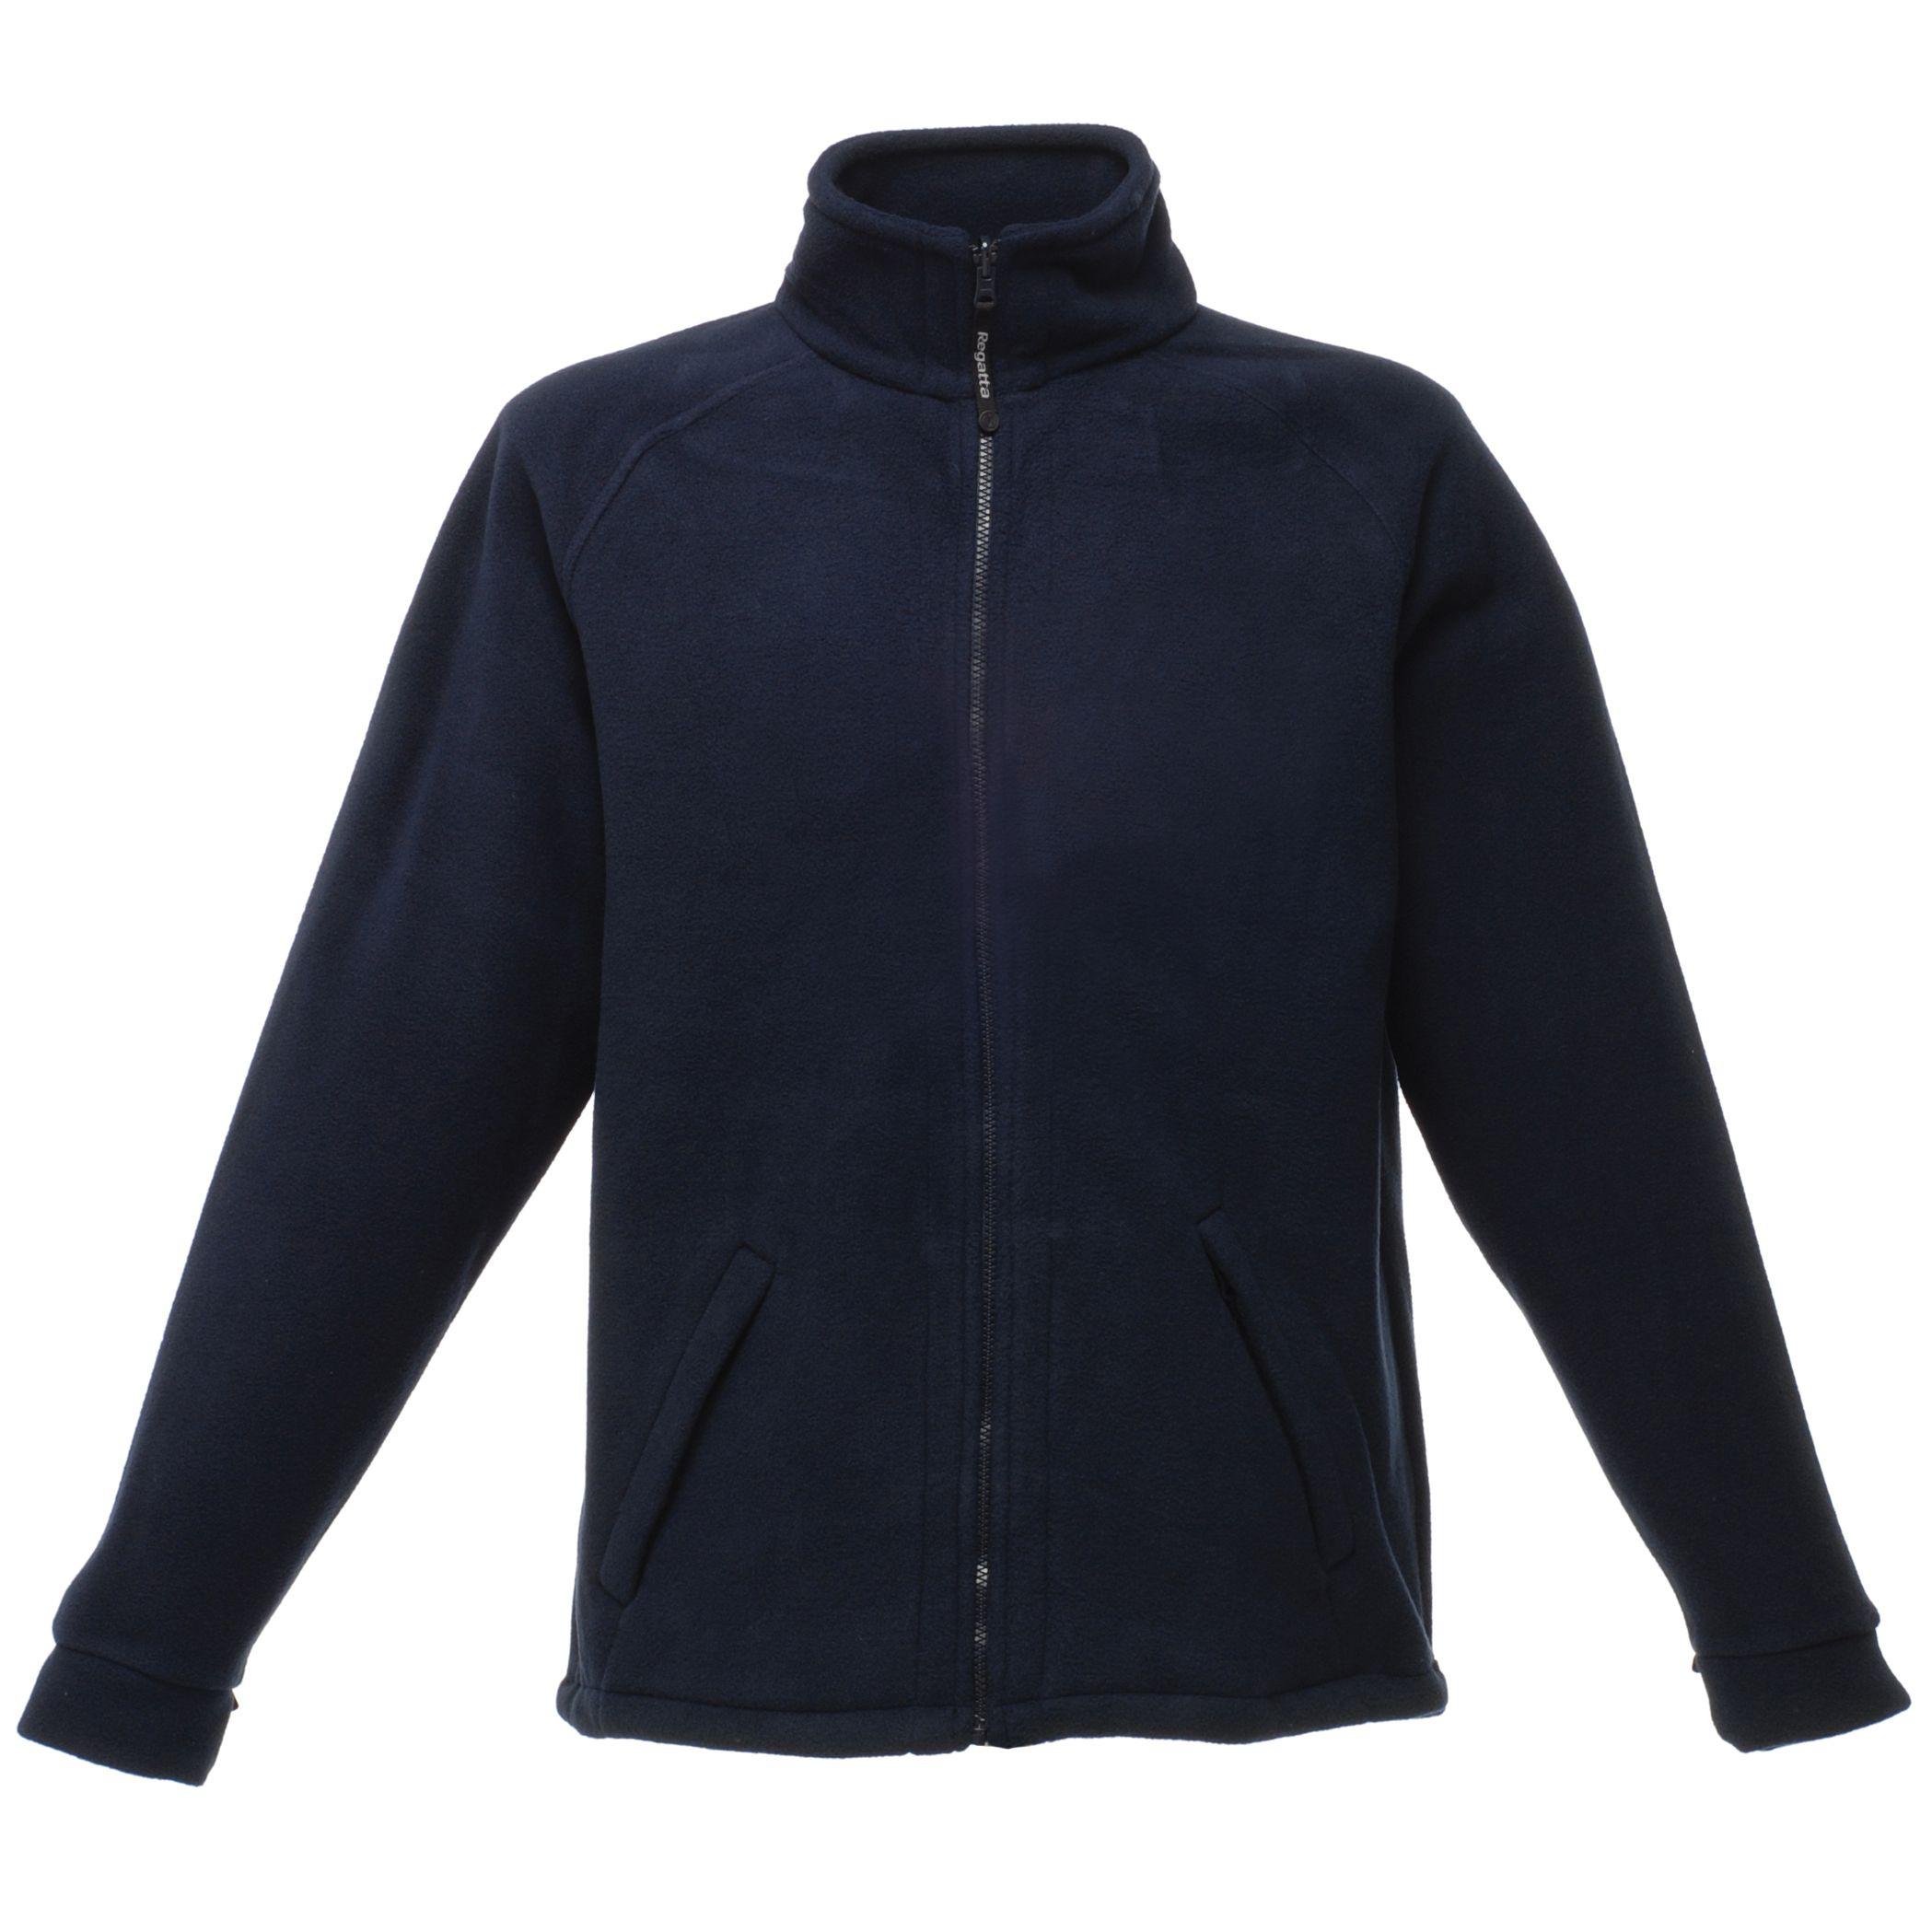 Regatta Sigma Symmetry Heavyweight Anti-Pill Fleece Jacket (380 GSM)